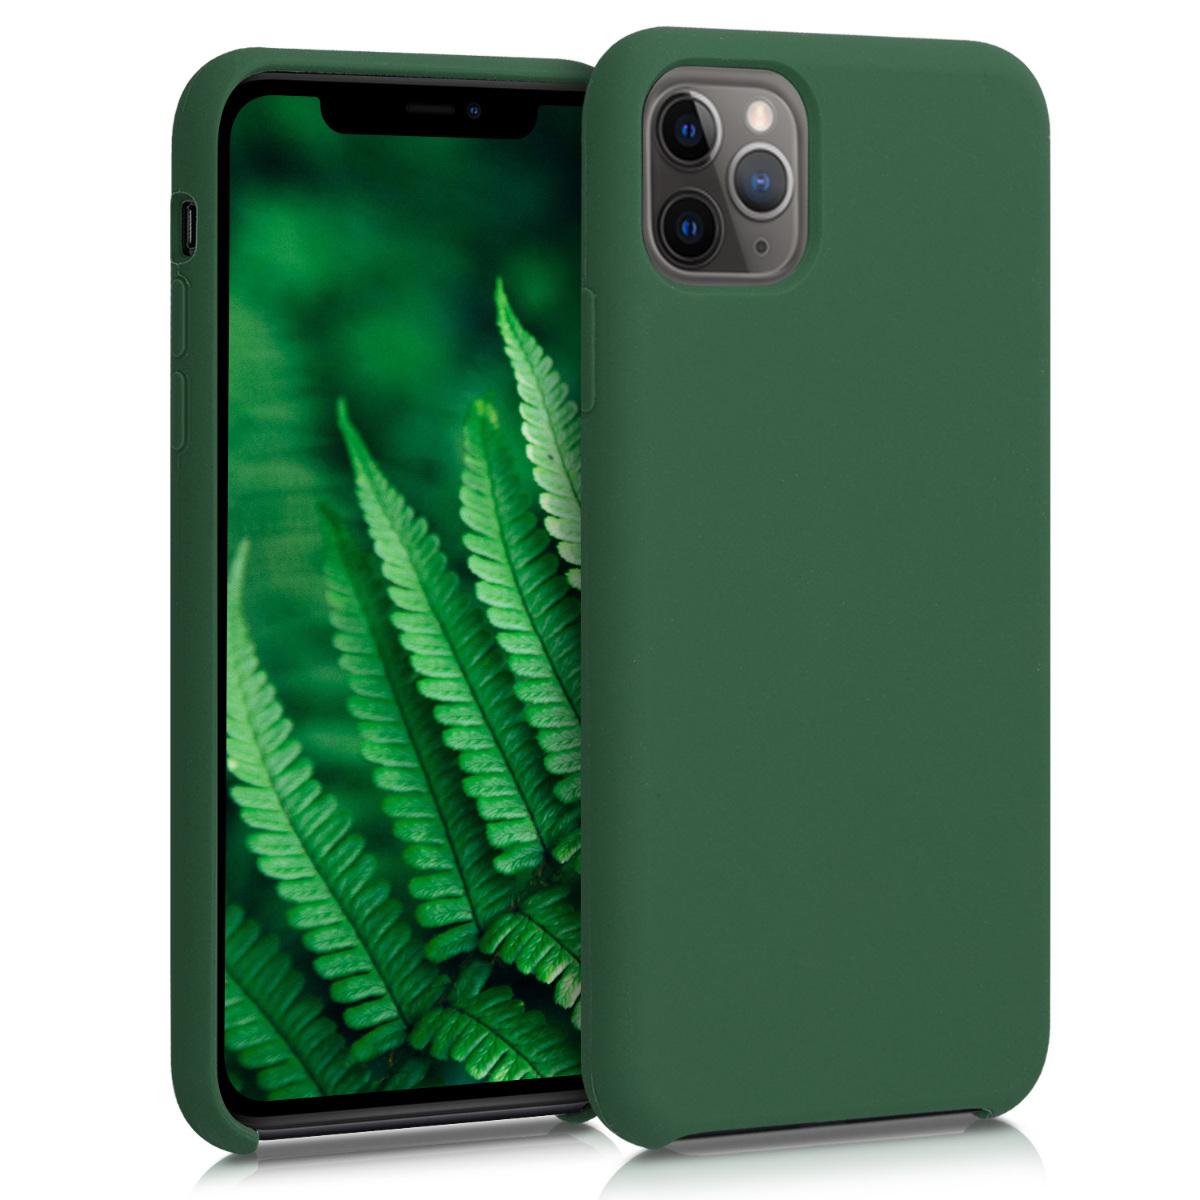 KW Θήκη Σιλικόνης iPhone 11 Pro Max - Soft Flexible Rubber - Dark Green (49725.80)